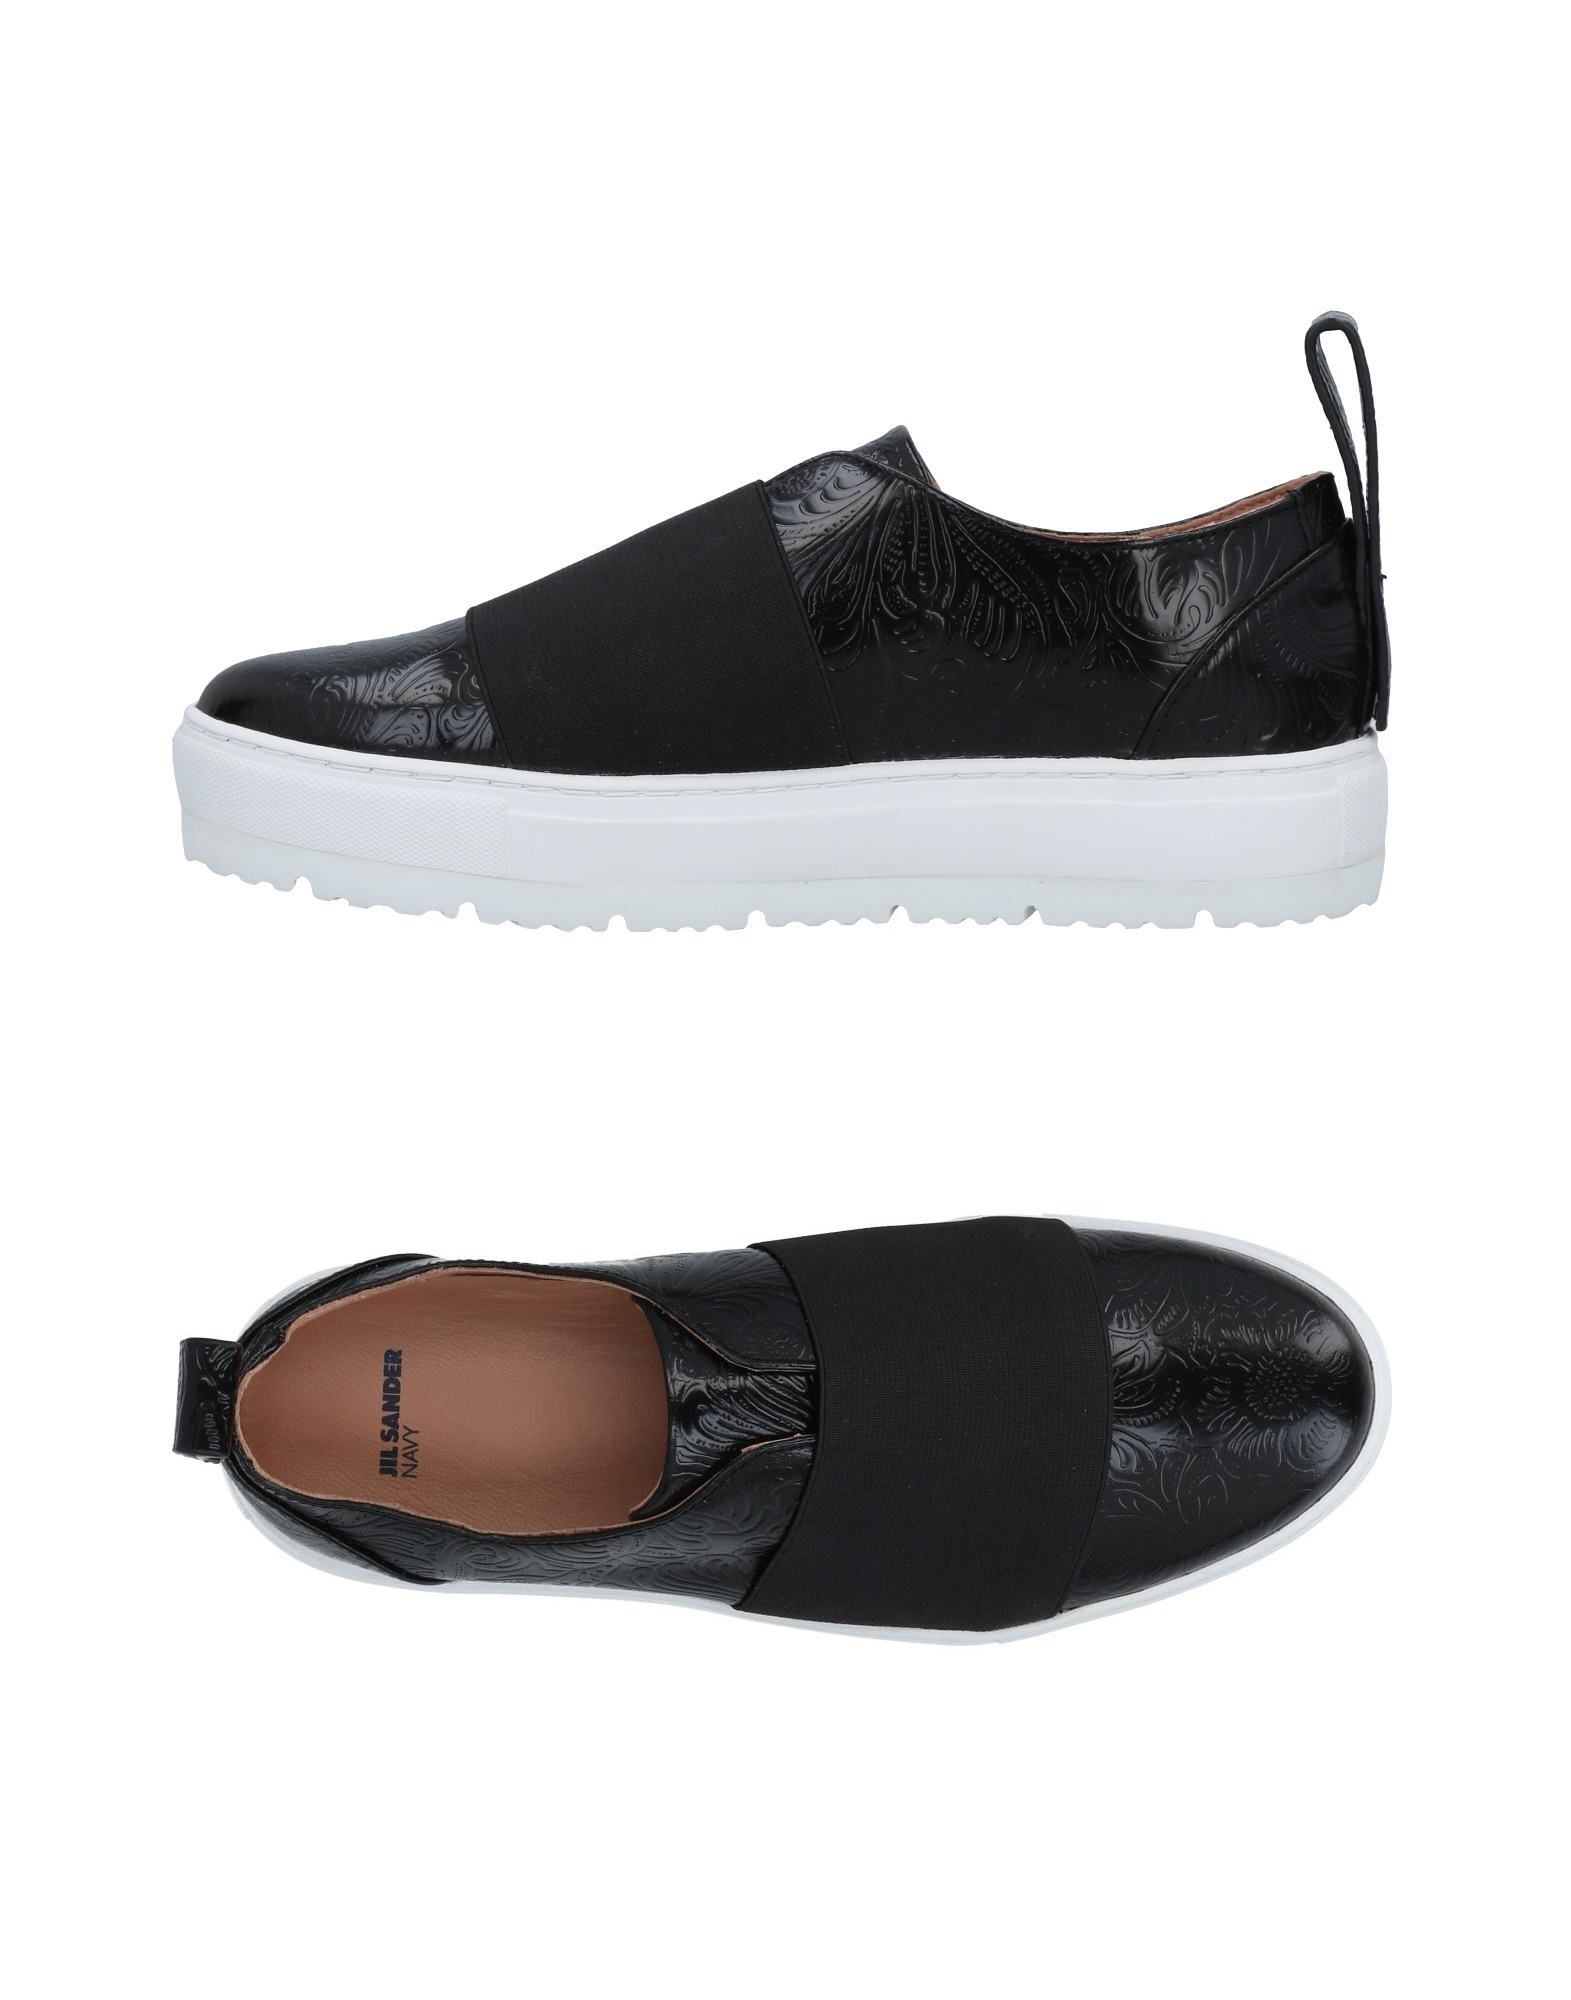 Stilvolle billige Schuhe Jil Sander Navy Sneakers Damen  11490835EH